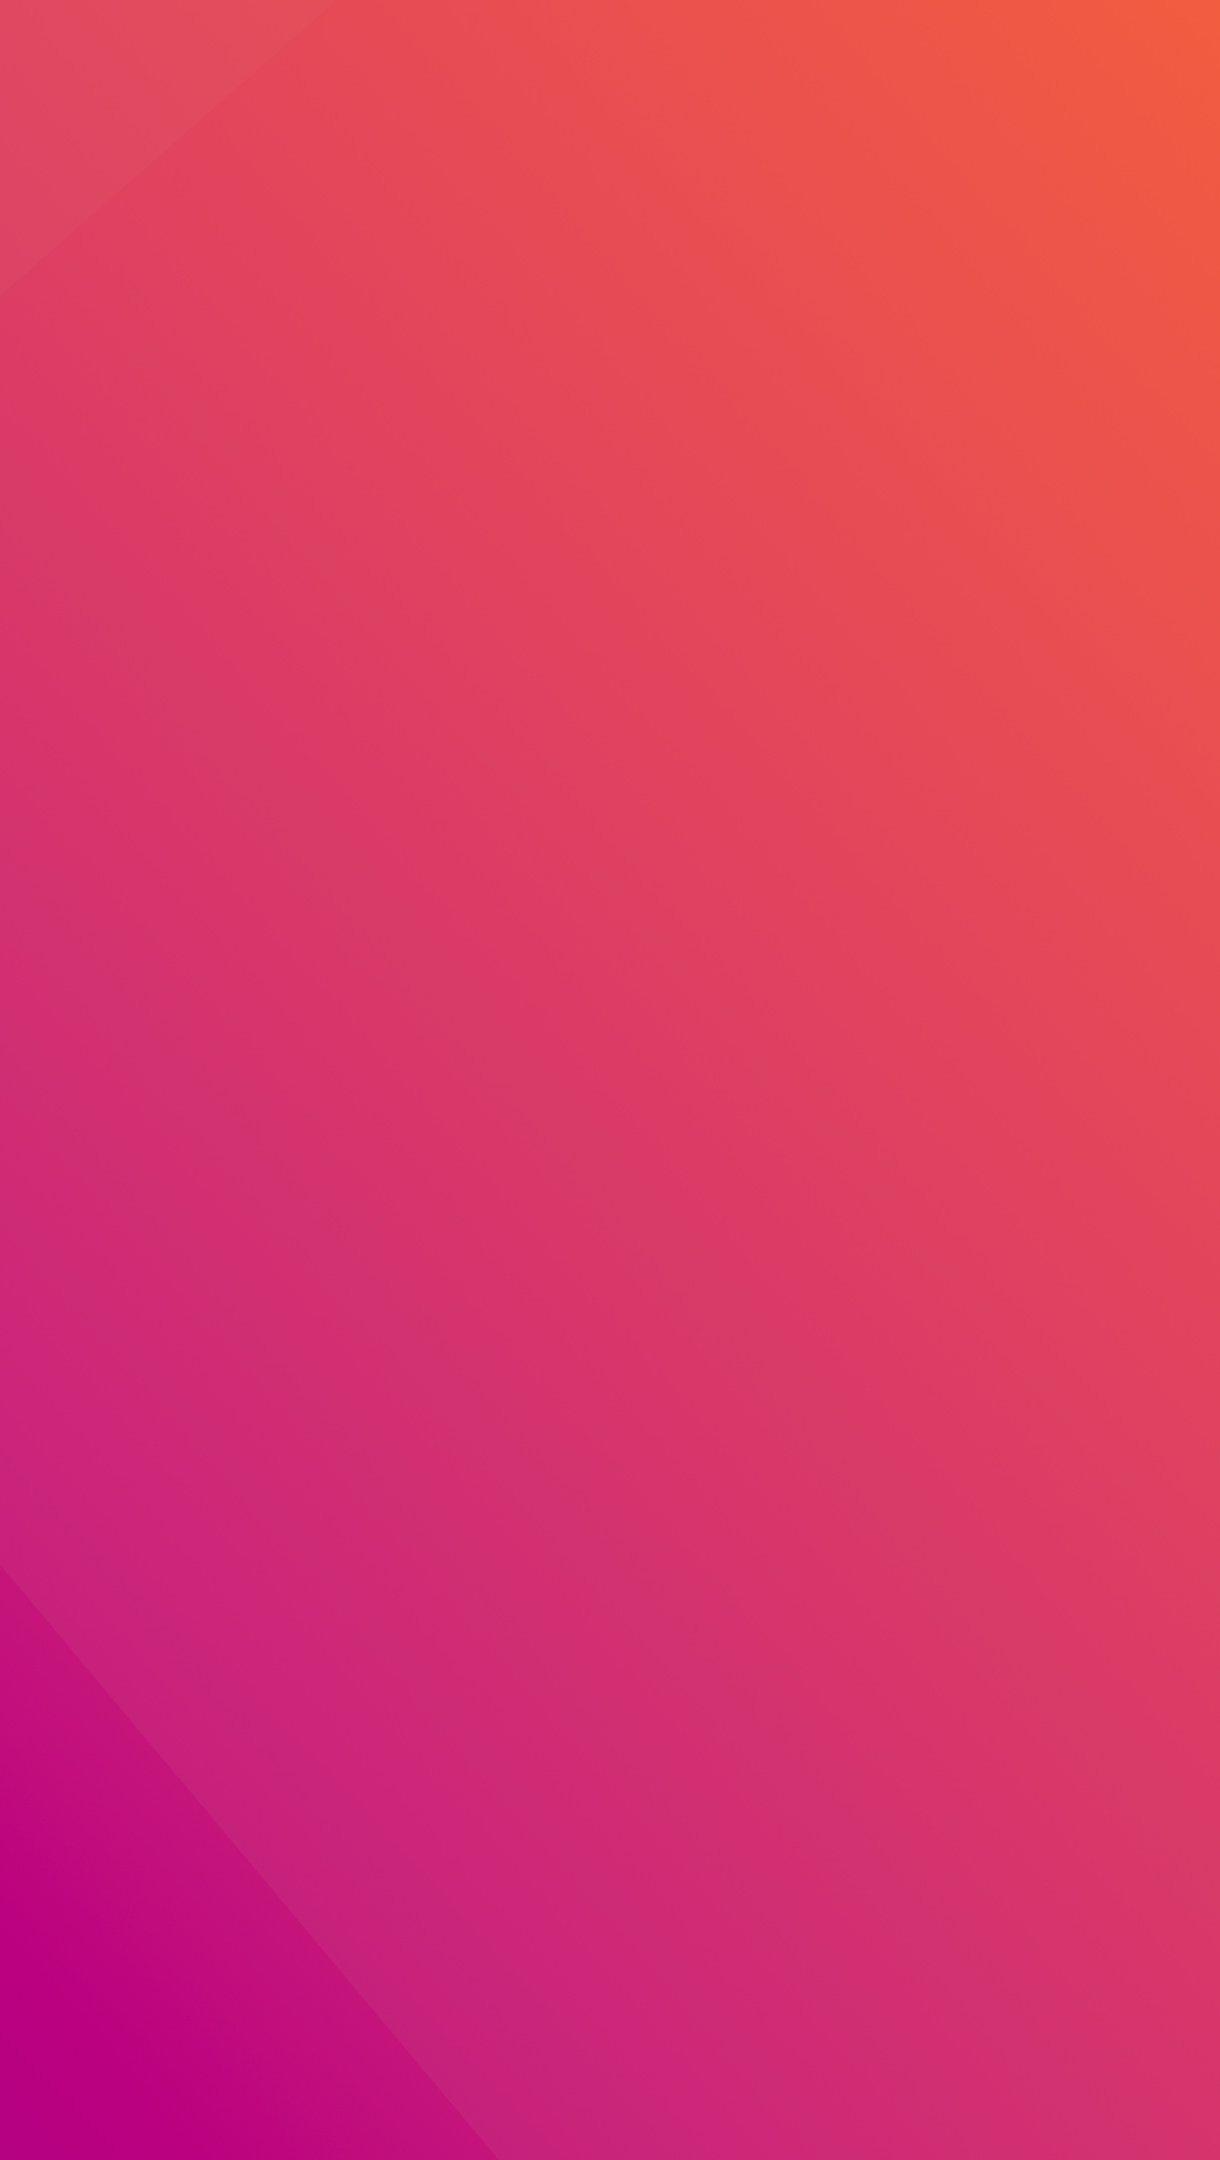 Fondos de pantalla Ubuntu Linux Minimalism Vertical